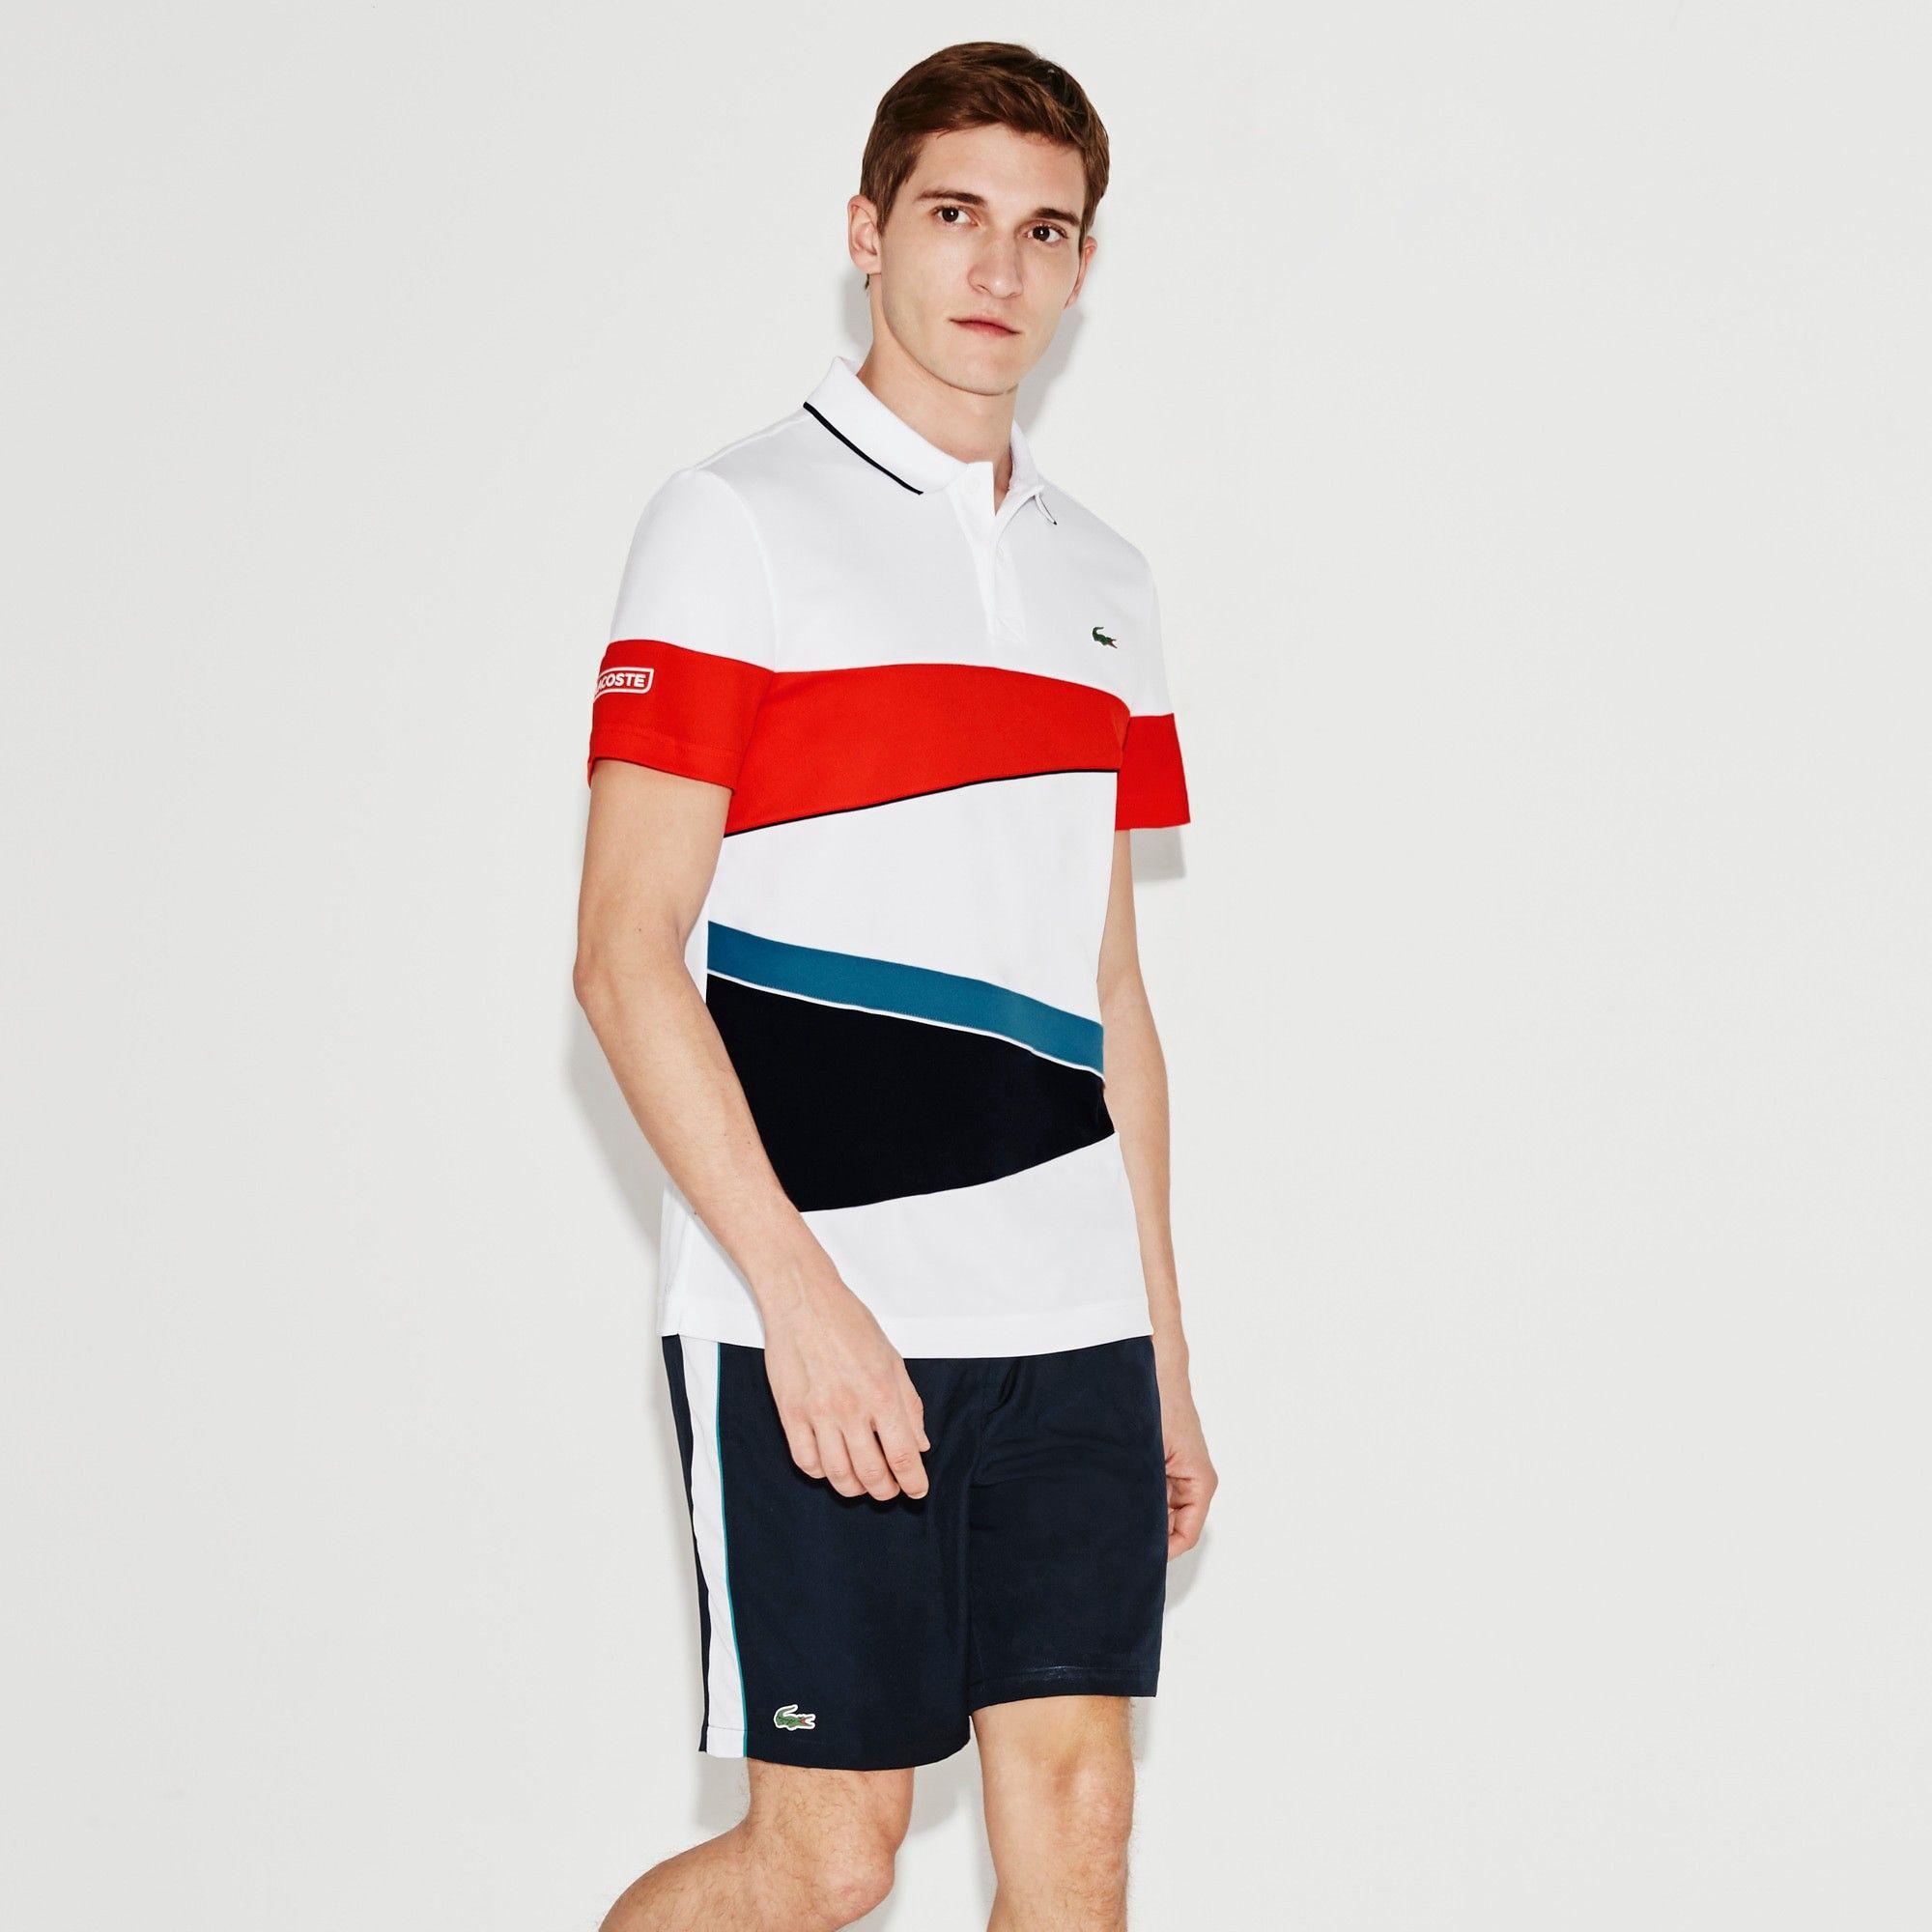 497b8266 LACOSTE Men's SPORT Piqué Tennis Polo Shirt - white/etna red-navy ...